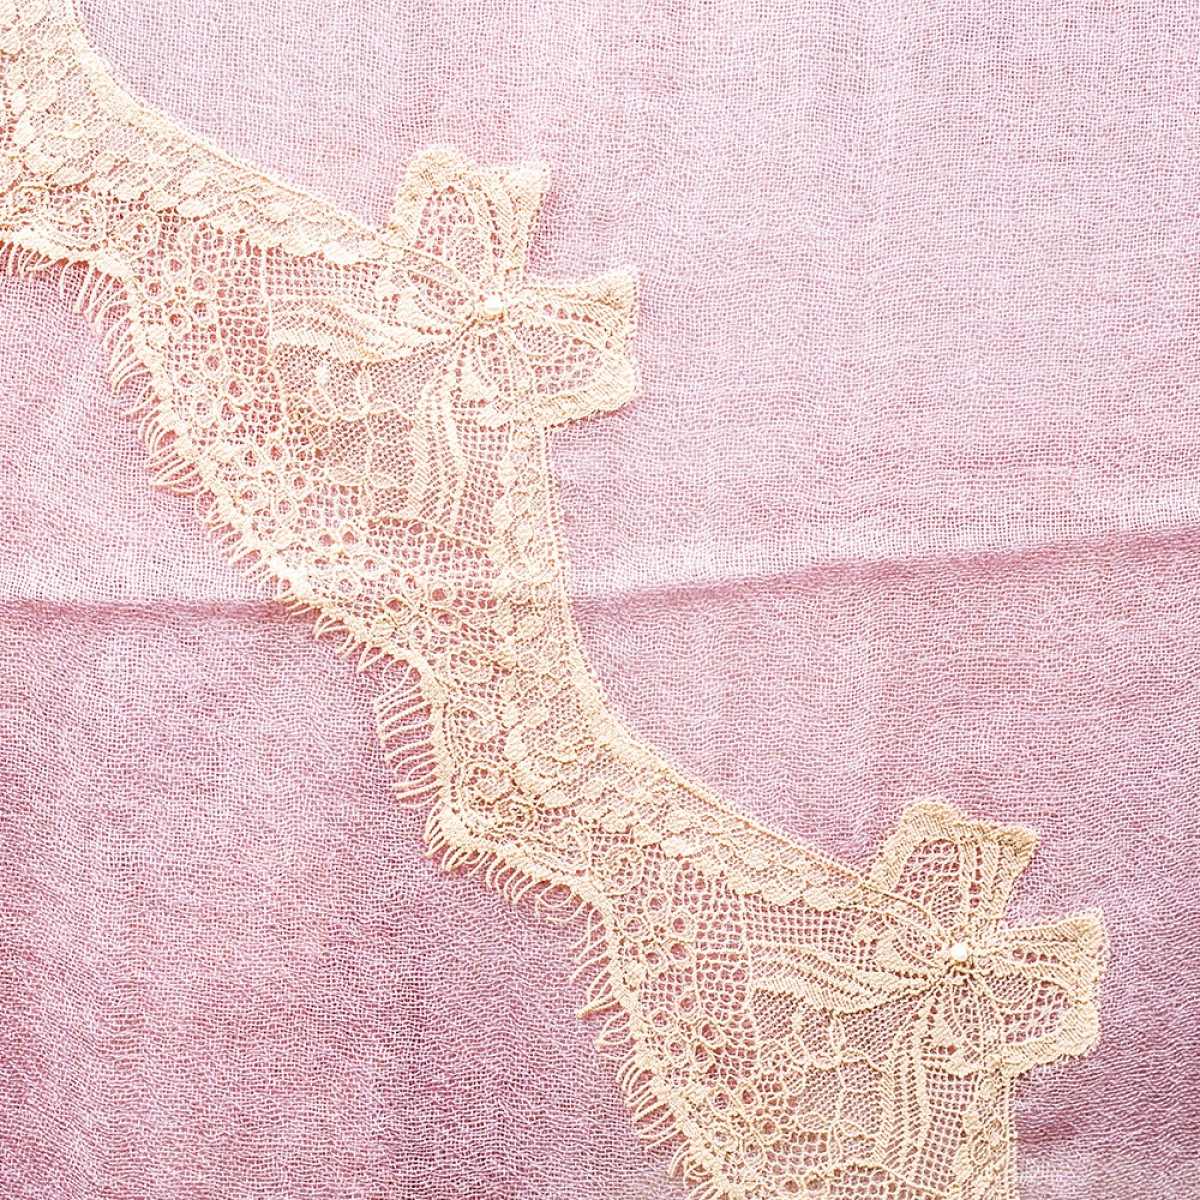 Lace Sheer Cashmere Pashmina Scarf - Lilac